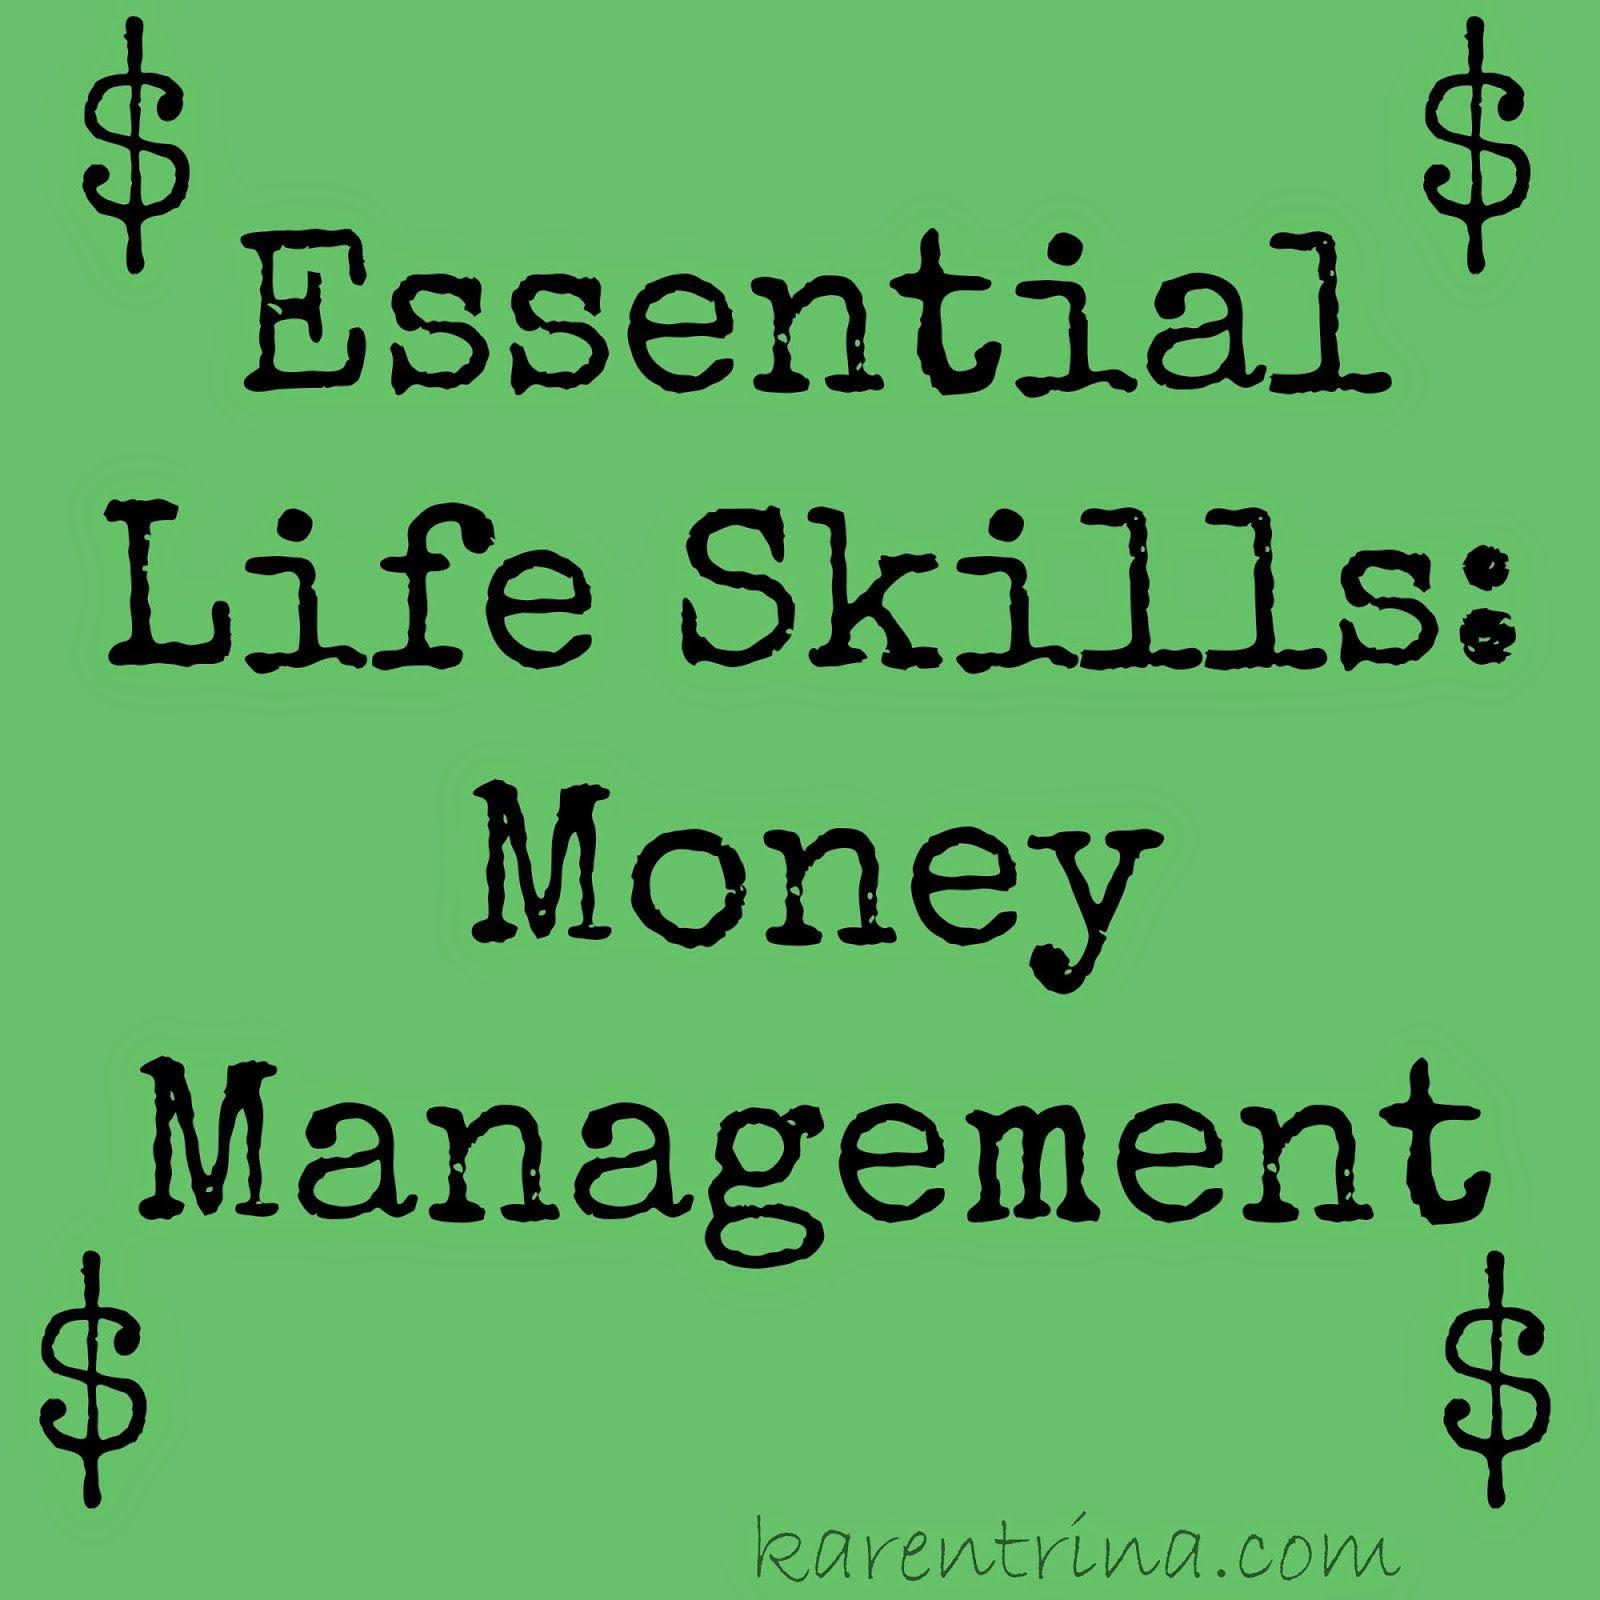 Essential Life Skills Money Management